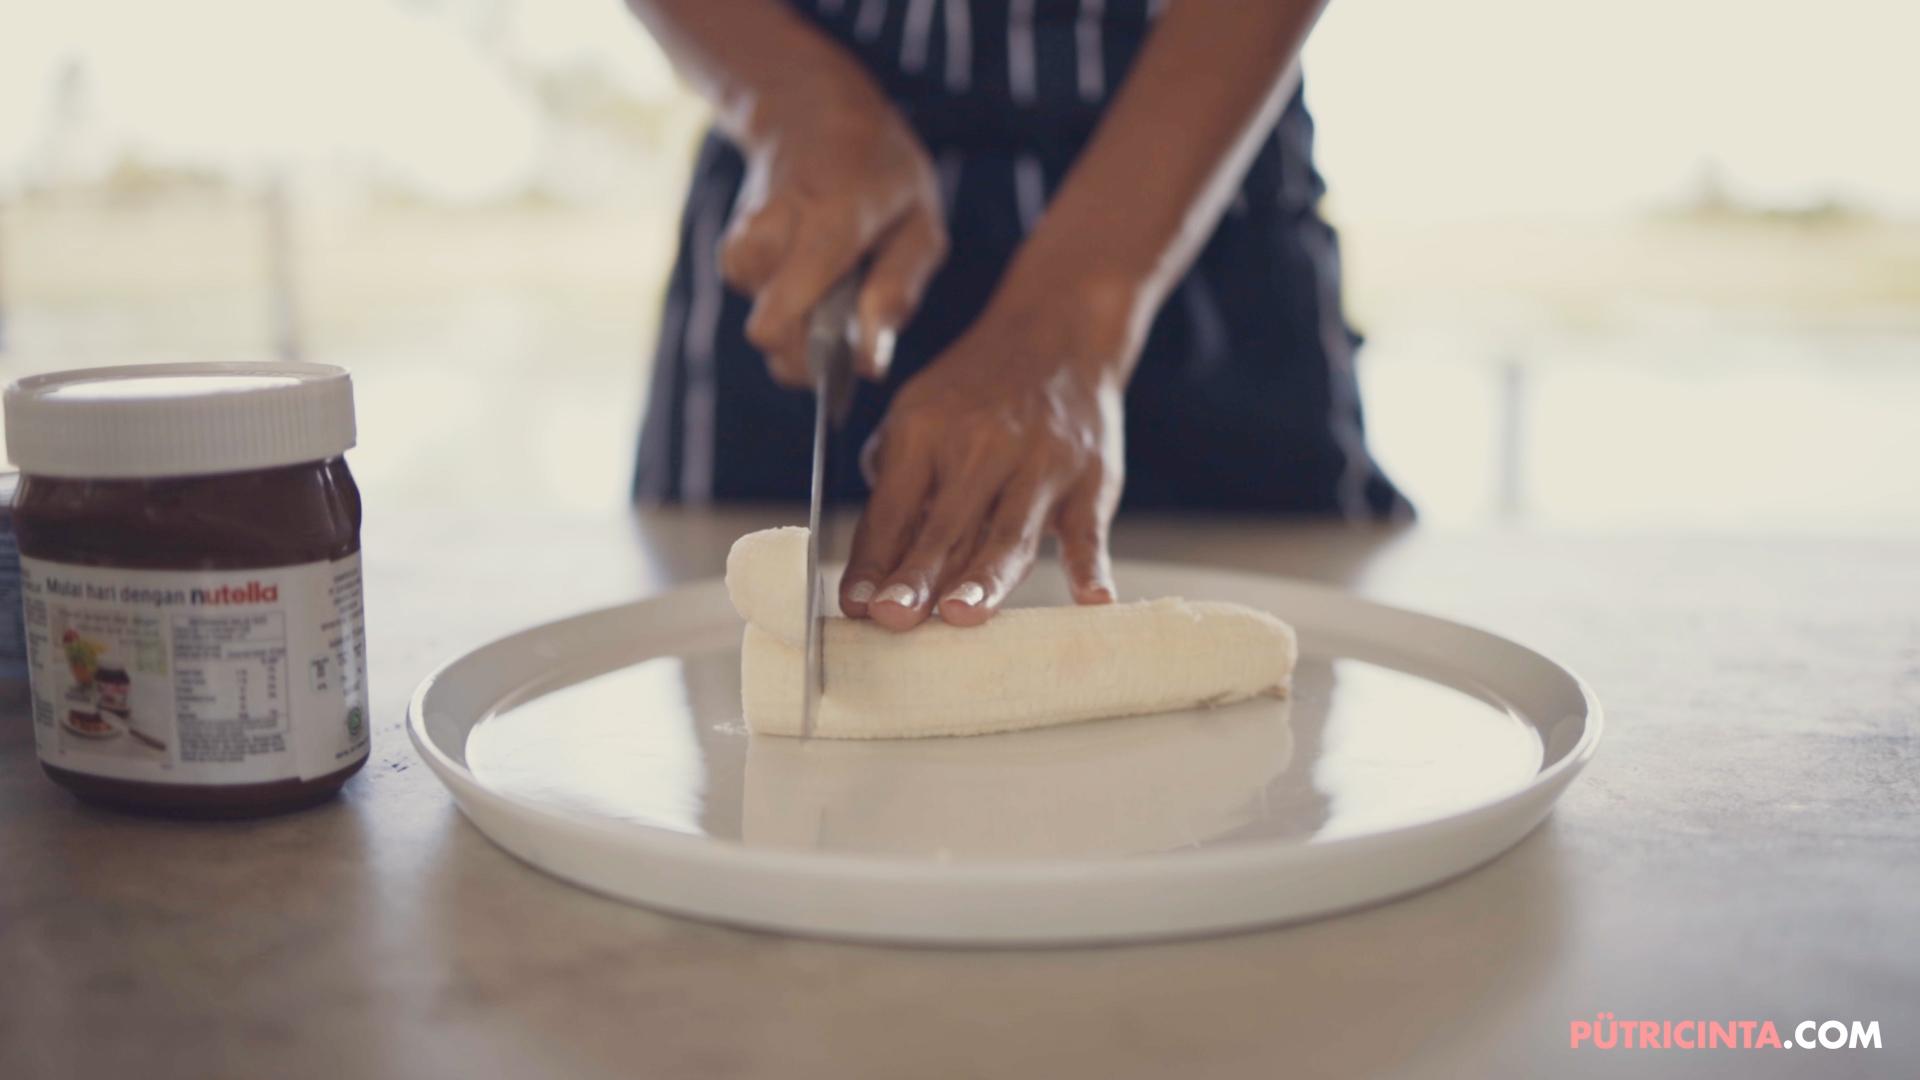 028-Putri-Cinta-Cooking-Class-mainvid-stills-15.jpg